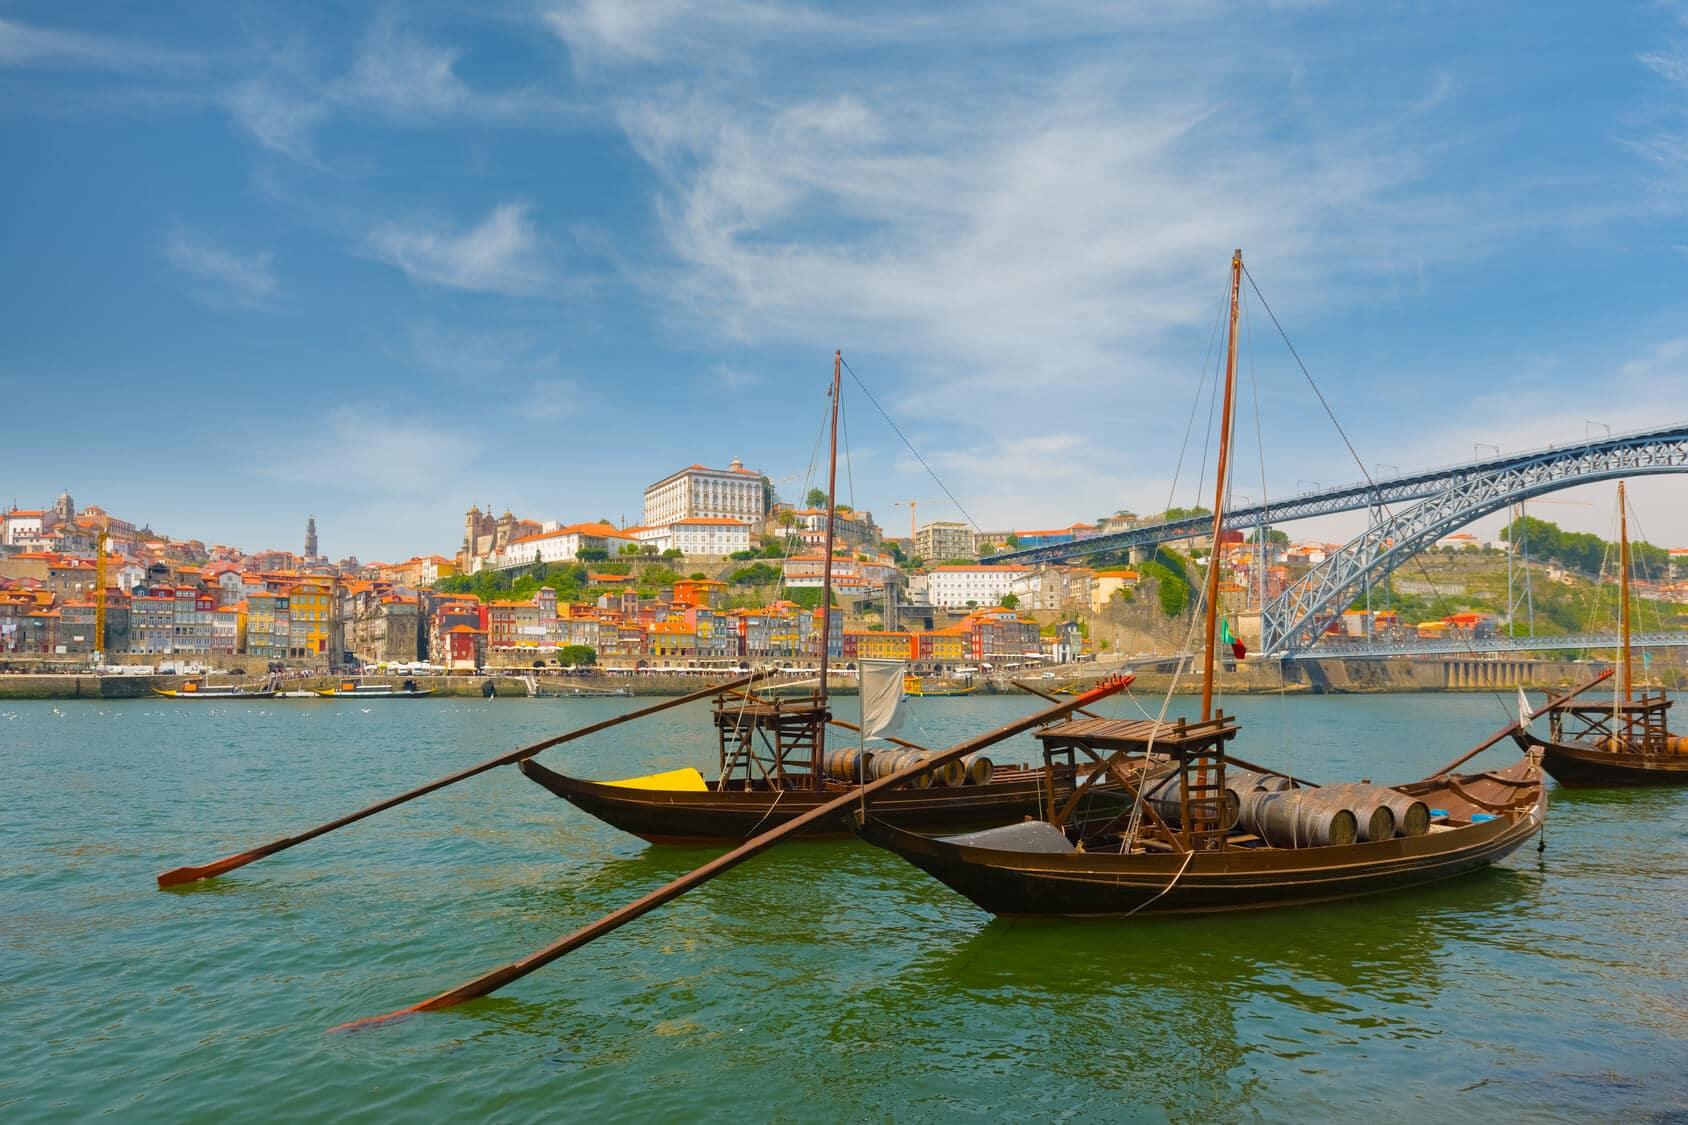 Barco e Rio no Porto